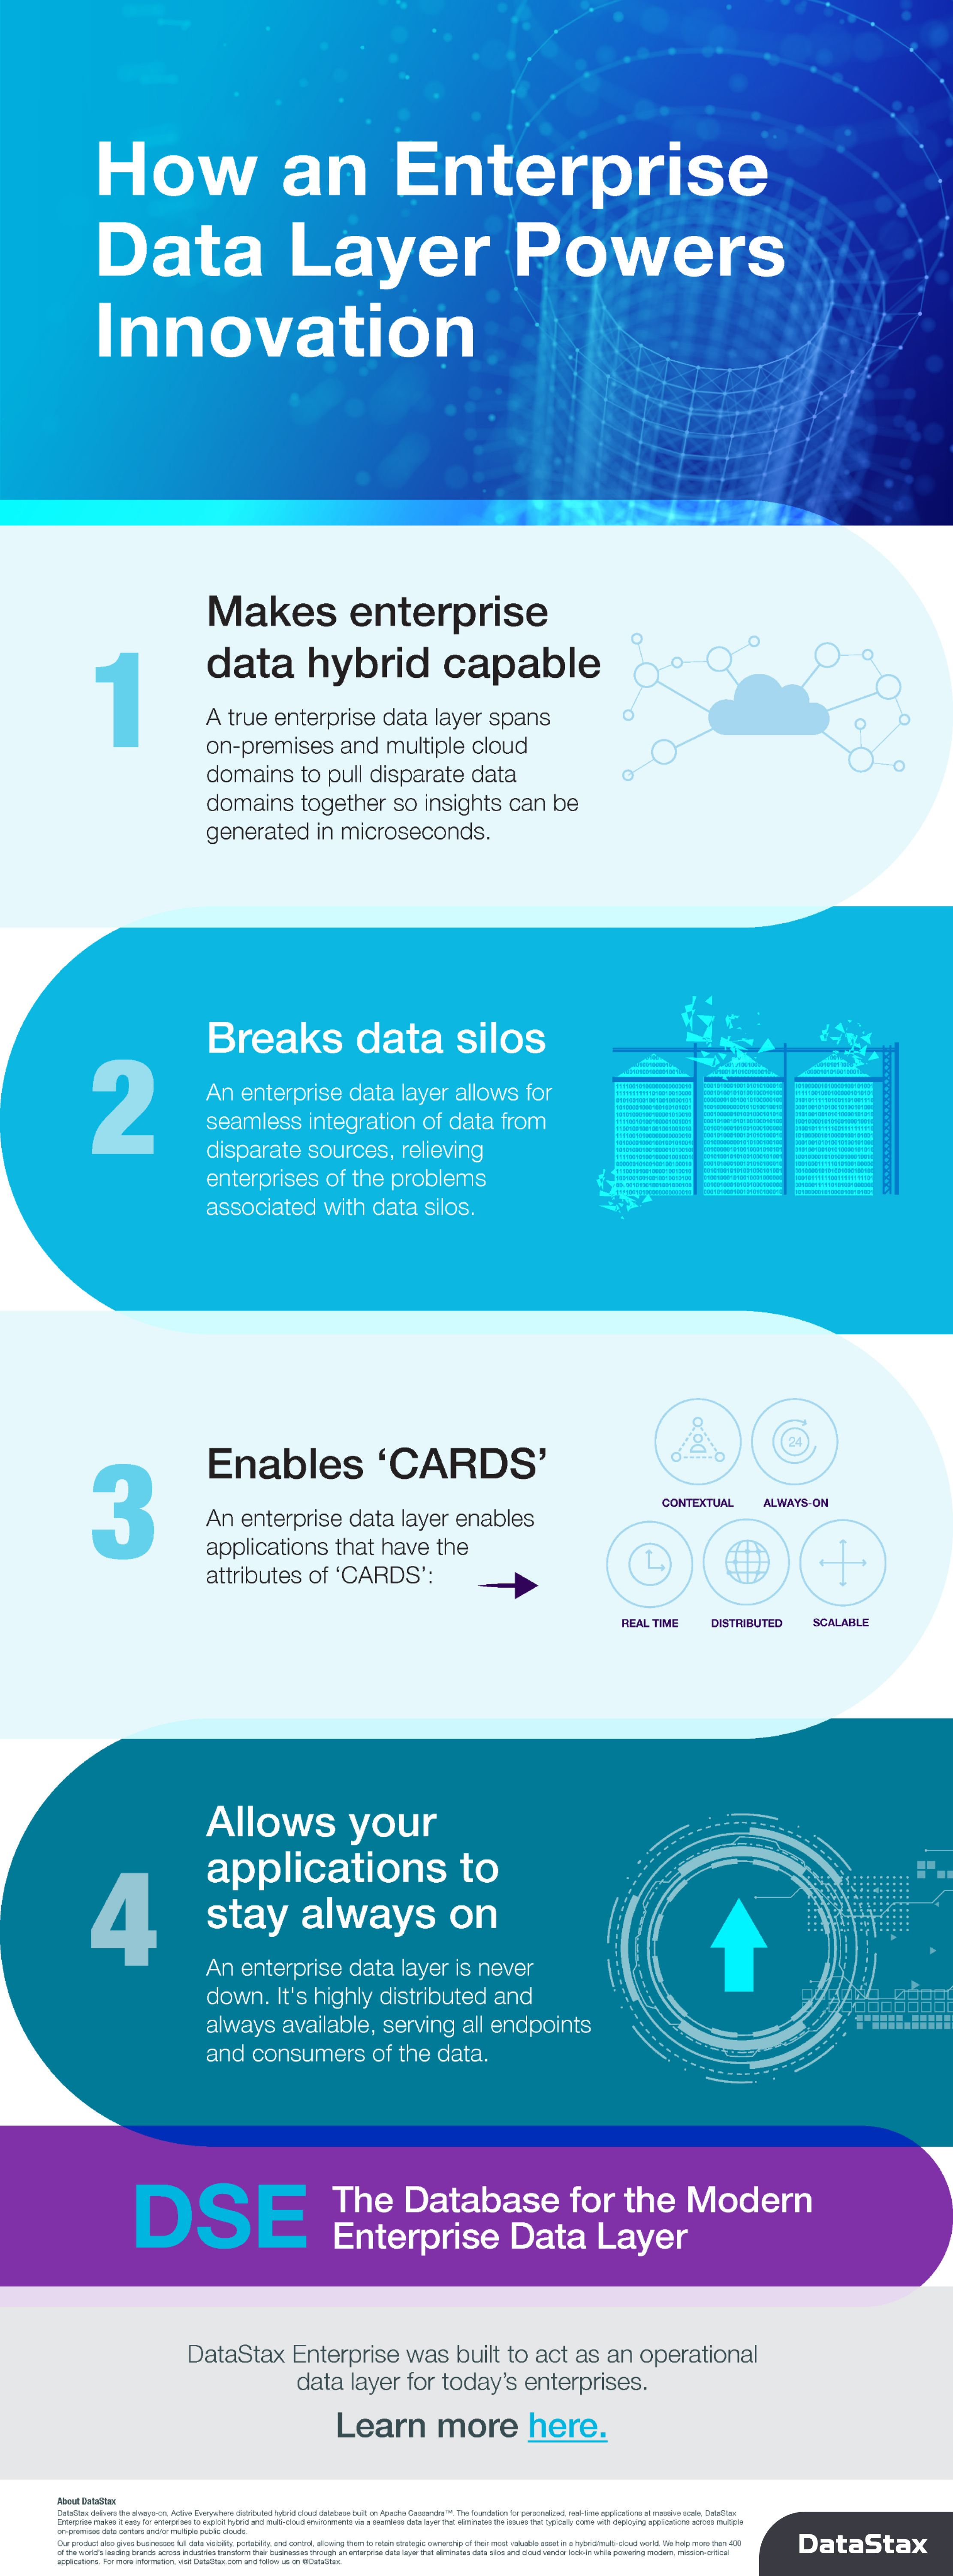 How an Enterprise Data Layer Powers Innovation